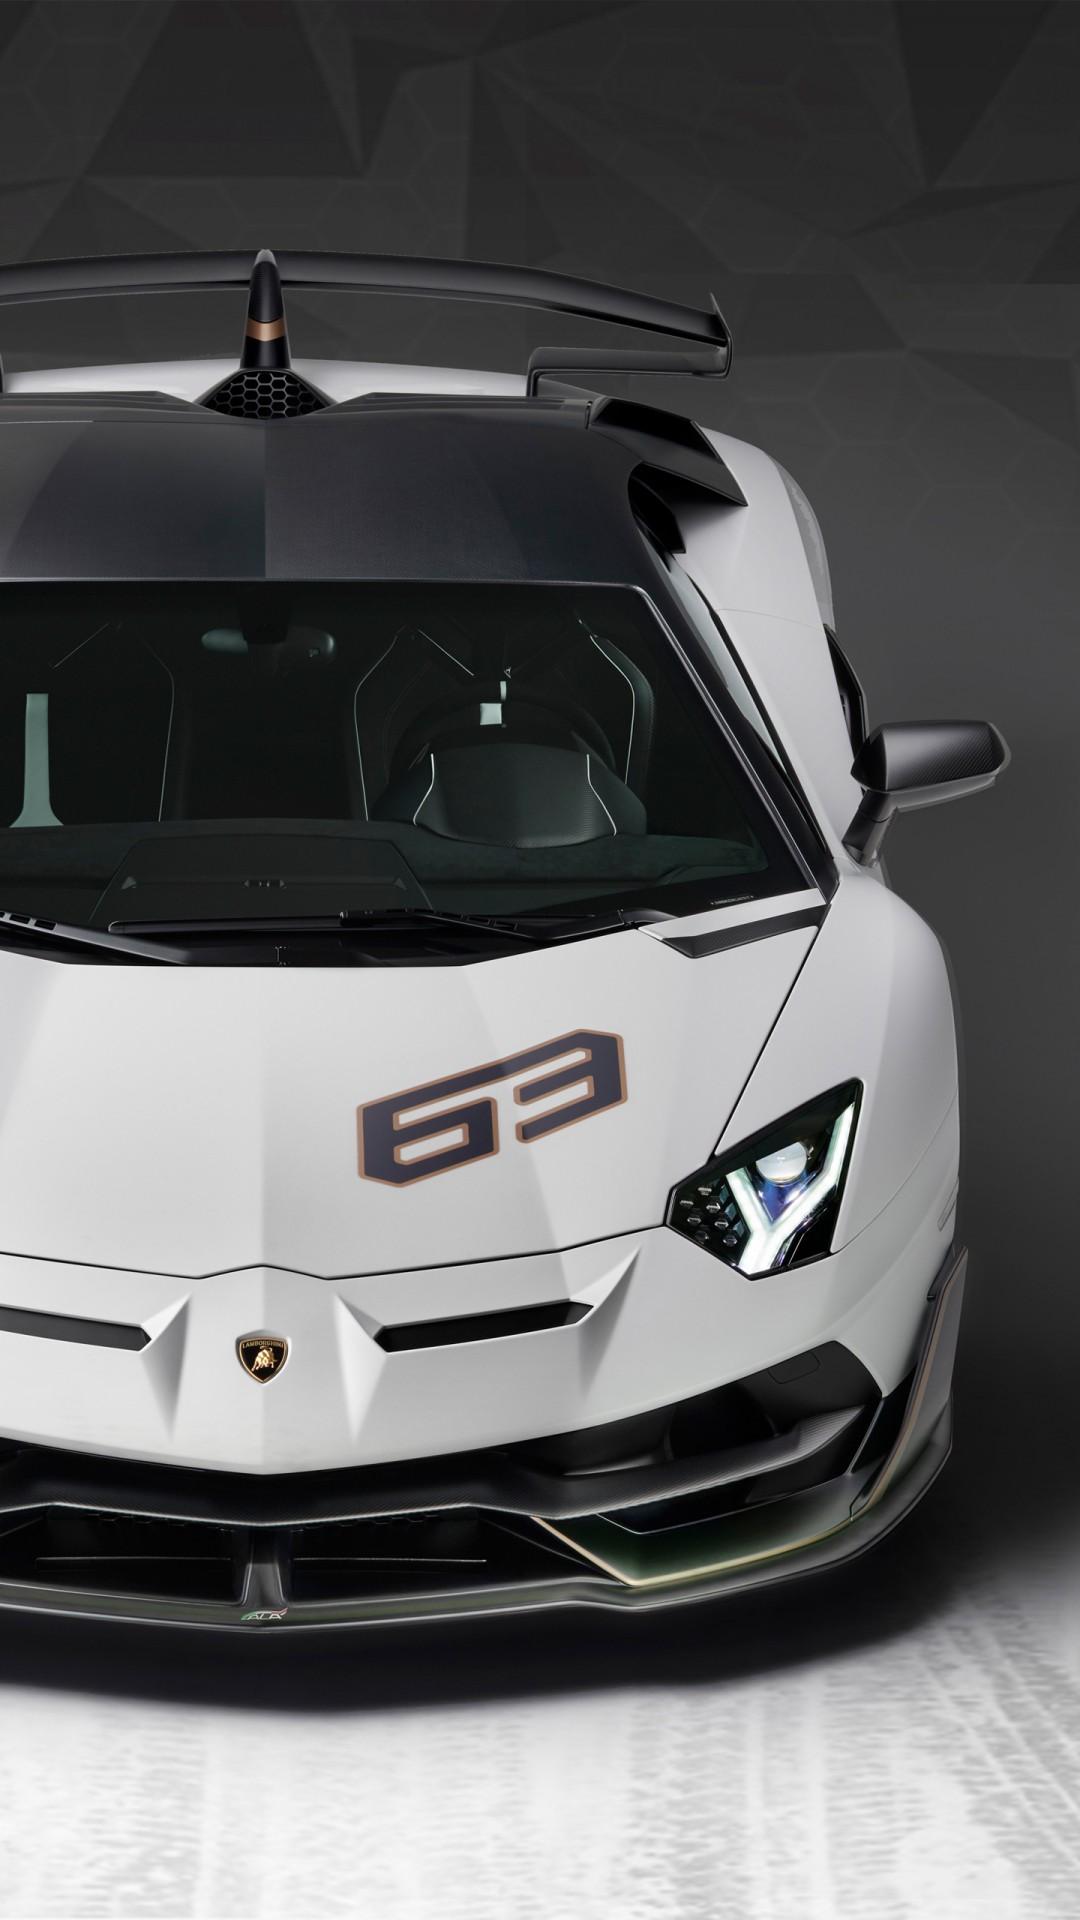 Ipad Hd Wallpaper  Lamborghini Aventador Svj 63 4k Wallpapers Hd Wallpapers